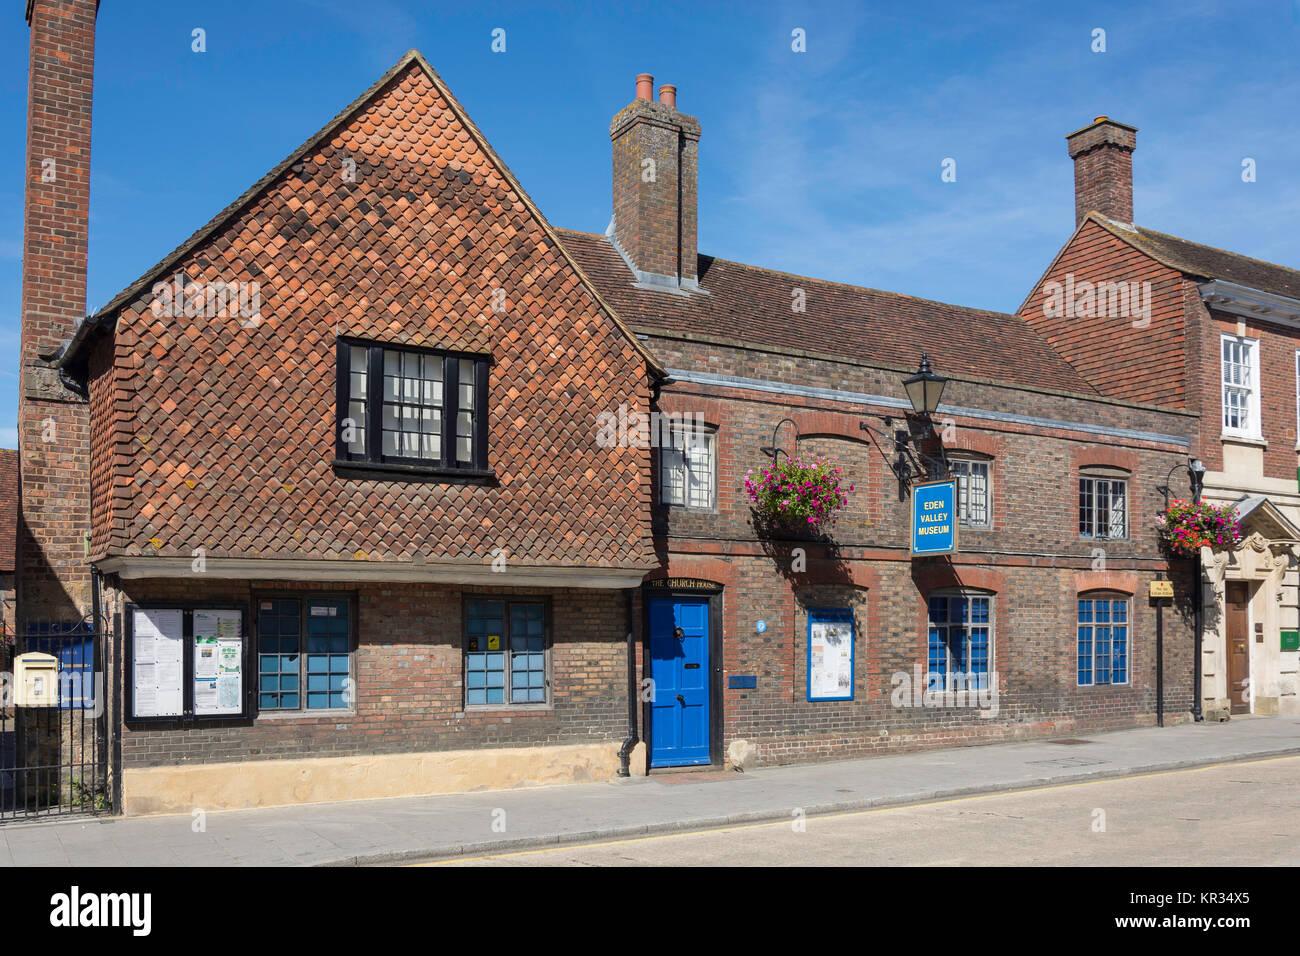 Eden Valley Museum, High Street, Edenbridge, Kent, England, United Kingdom - Stock Image